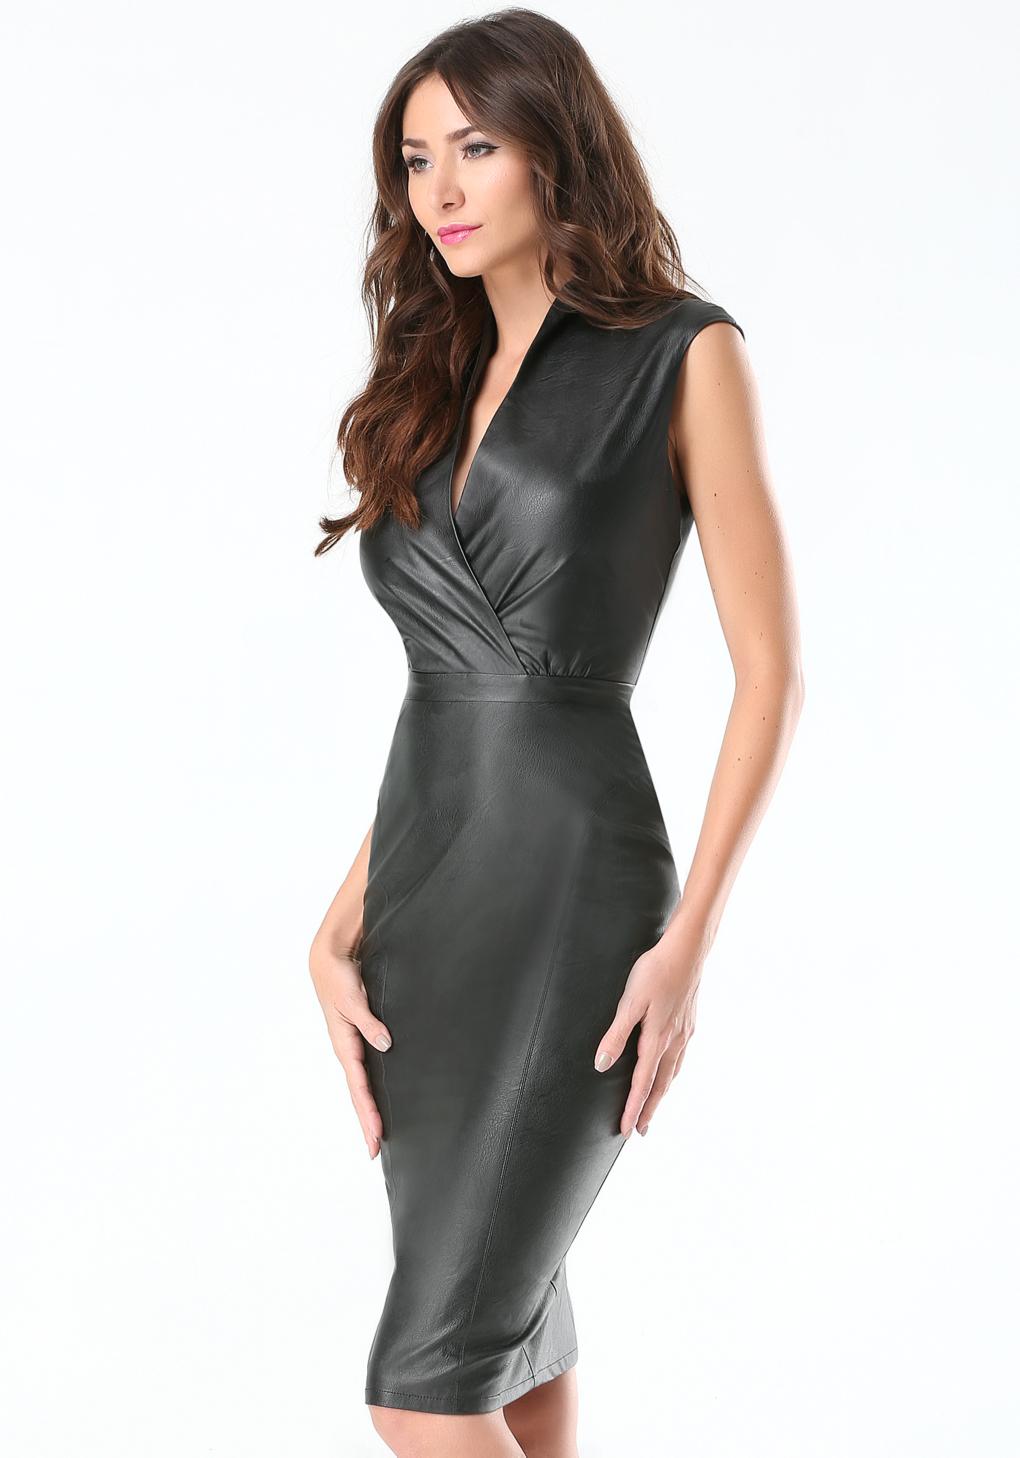 5887af63b5 Lyst - Bebe Petite Faux Leather Dress in Black